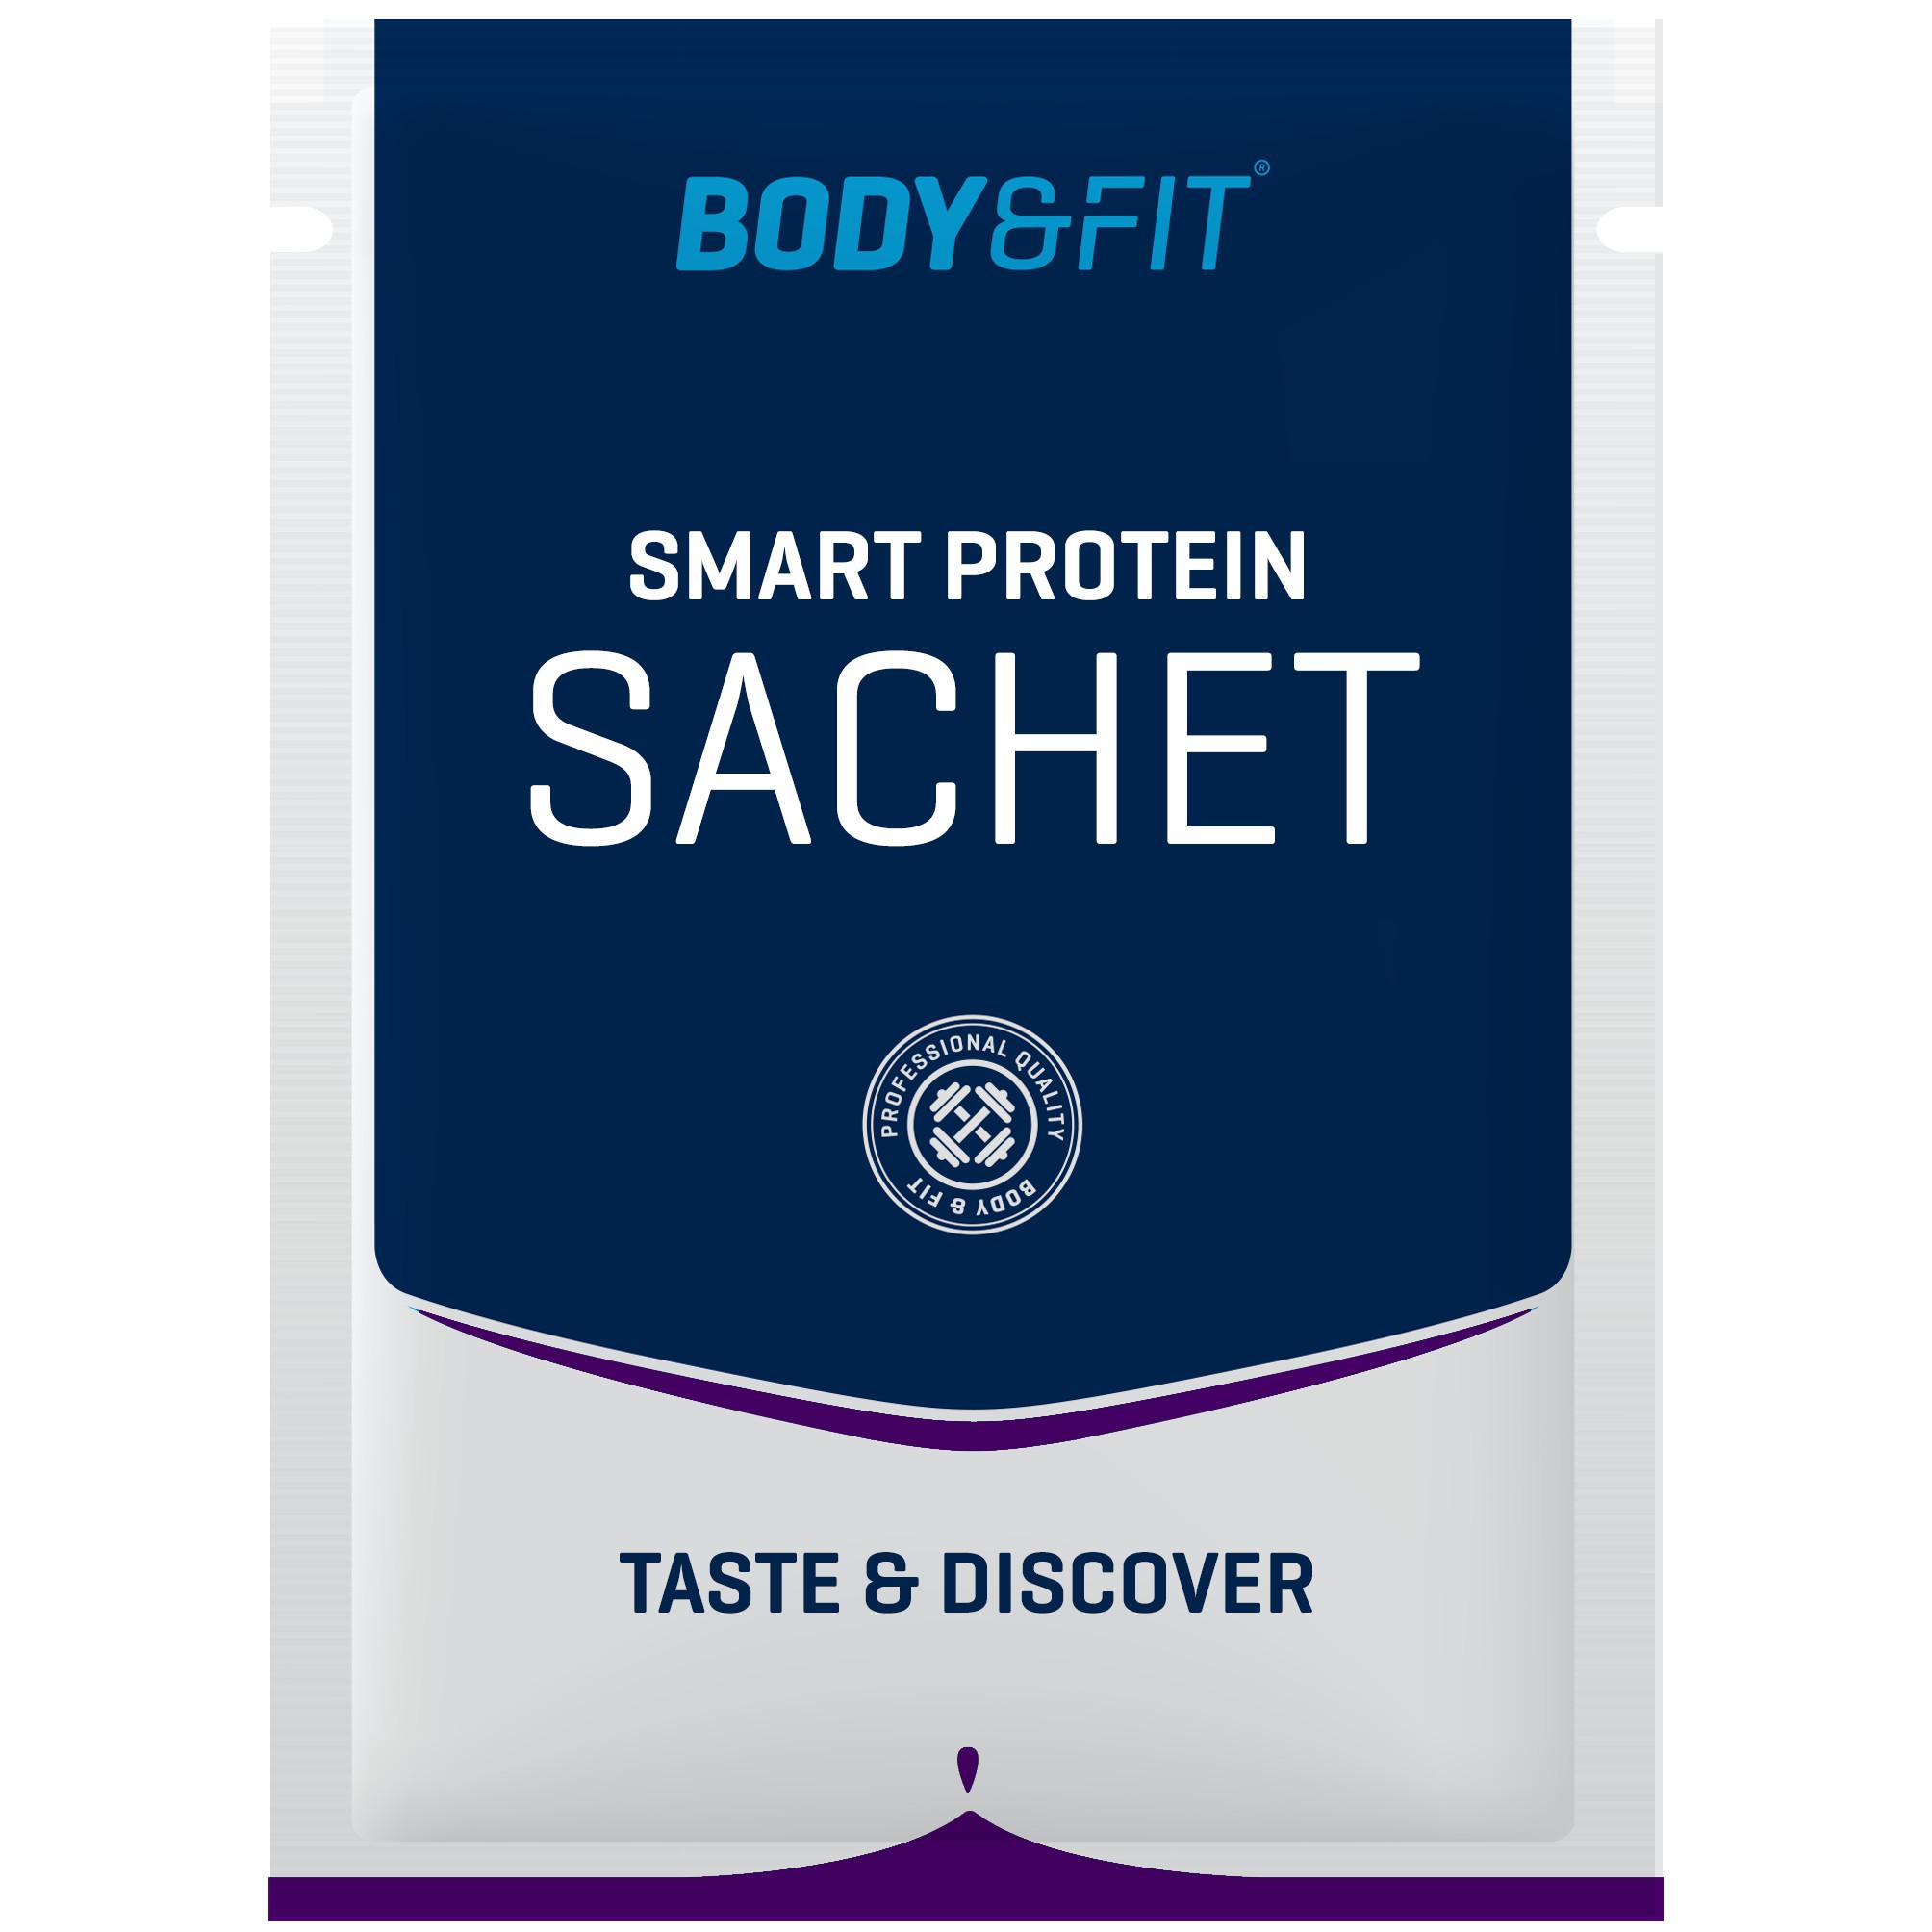 Smart Protein Sachet